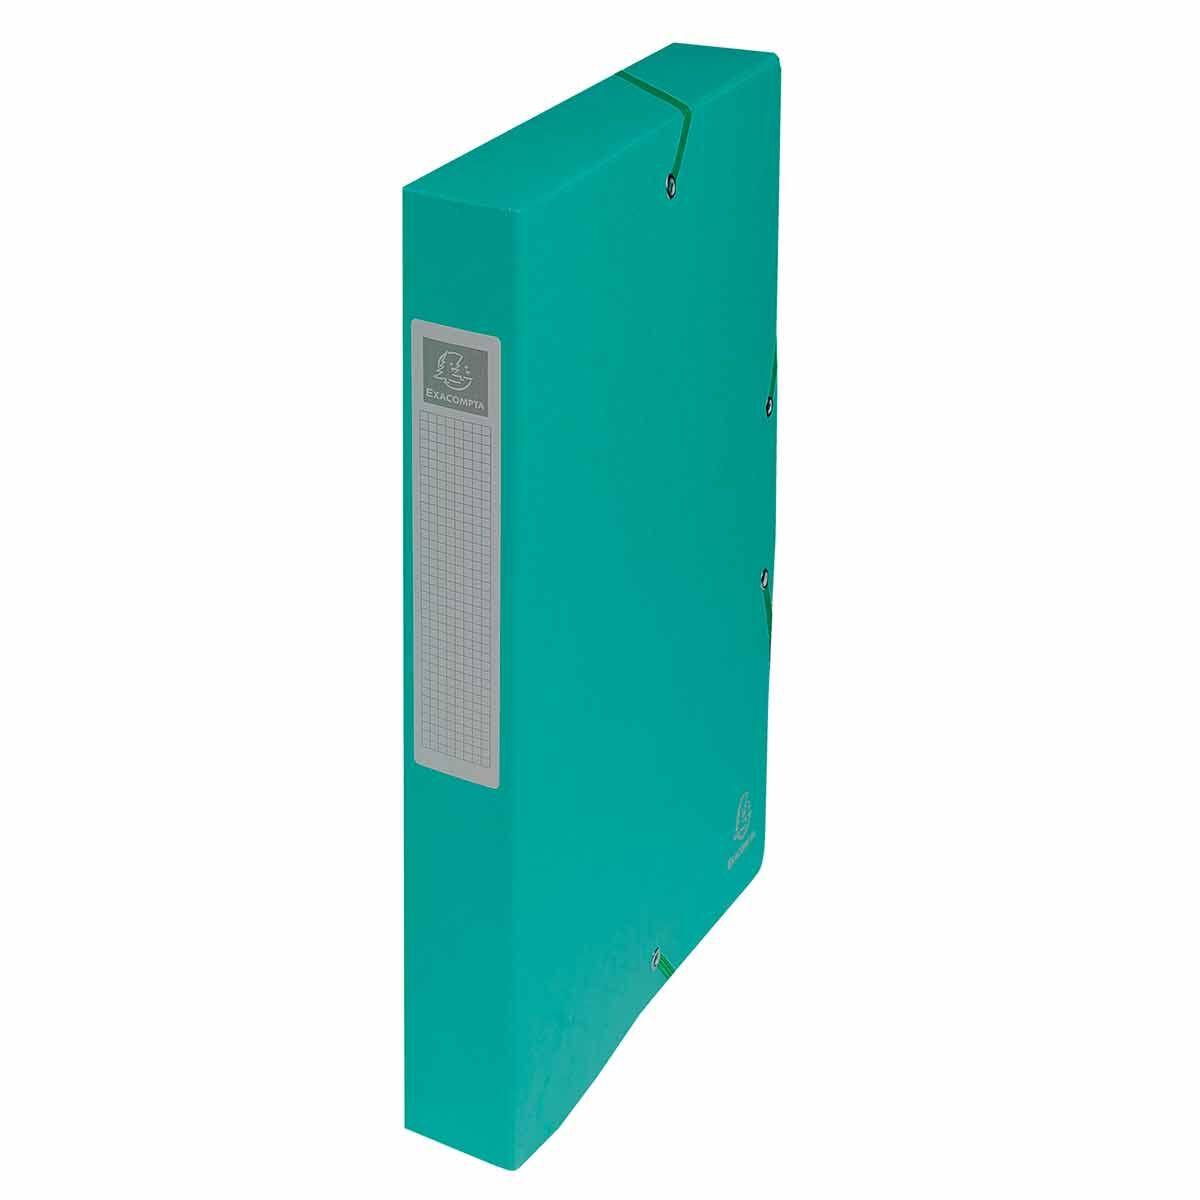 Exacompta Elasticated Box File Pressboard A4 40mm Pack of 8 Green